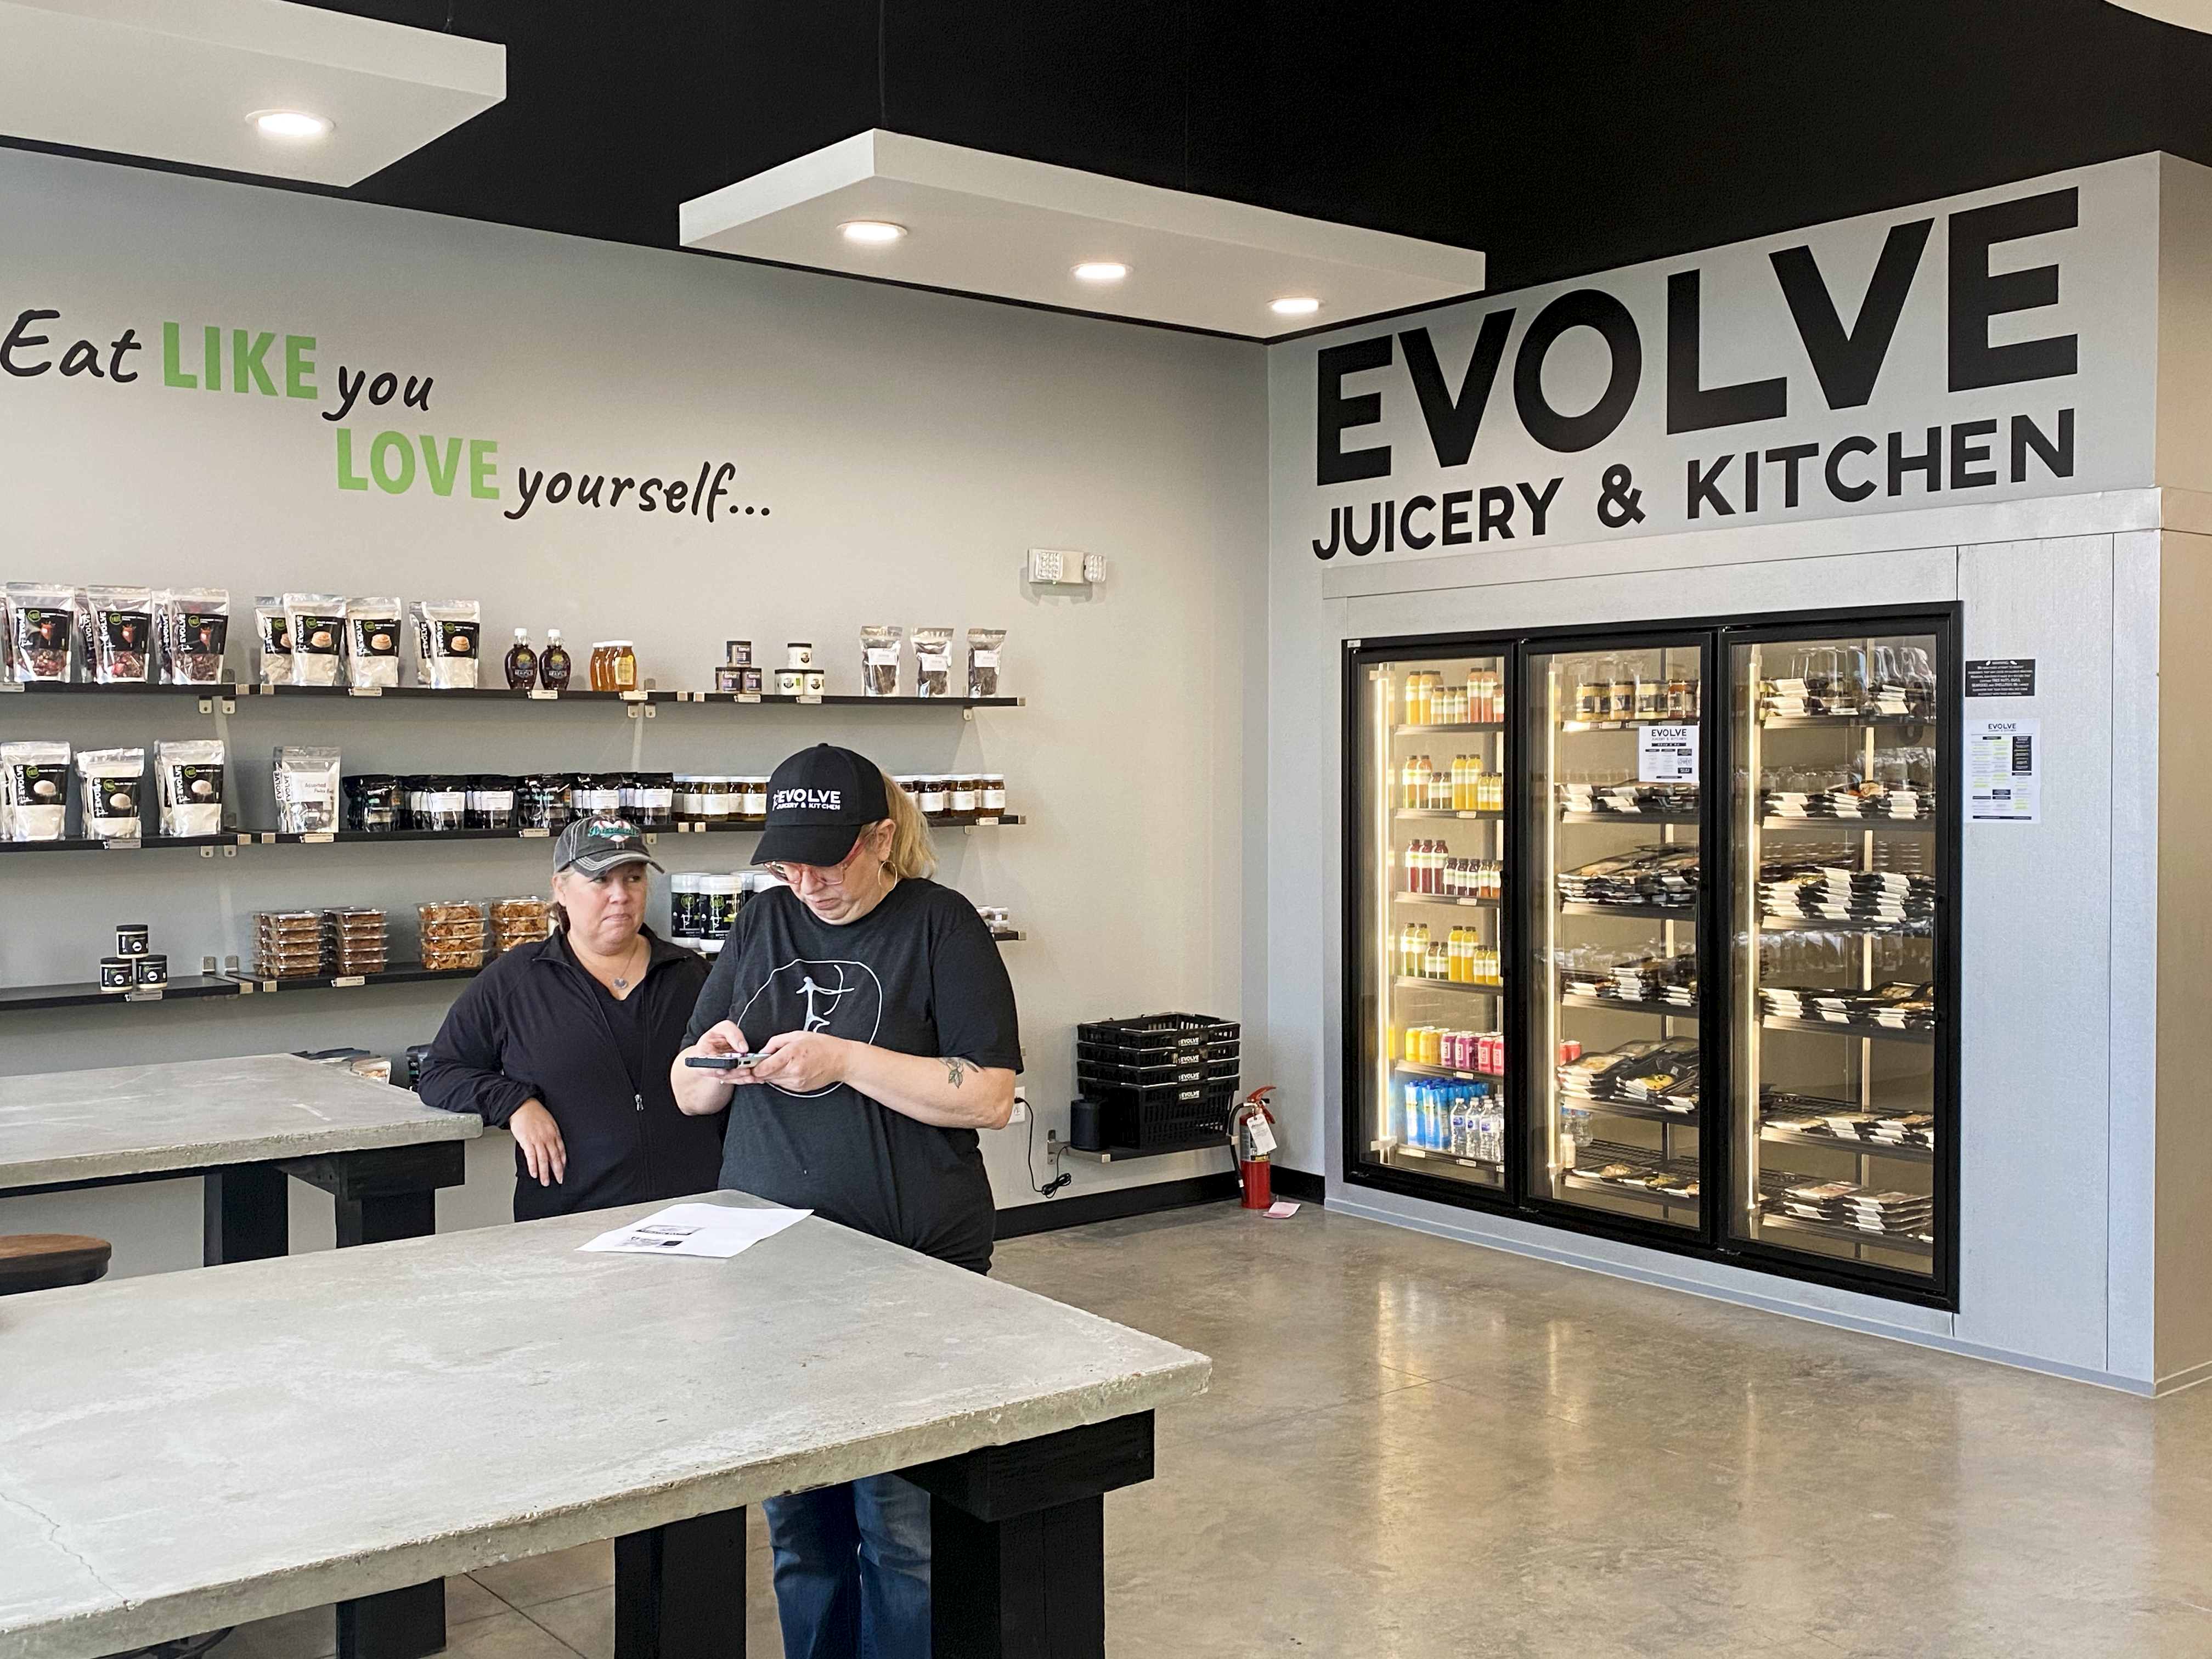 Evolve Juicery & Kitchen - Overland Park, KS 66204 - (913)730-9730 | ShowMeLocal.com